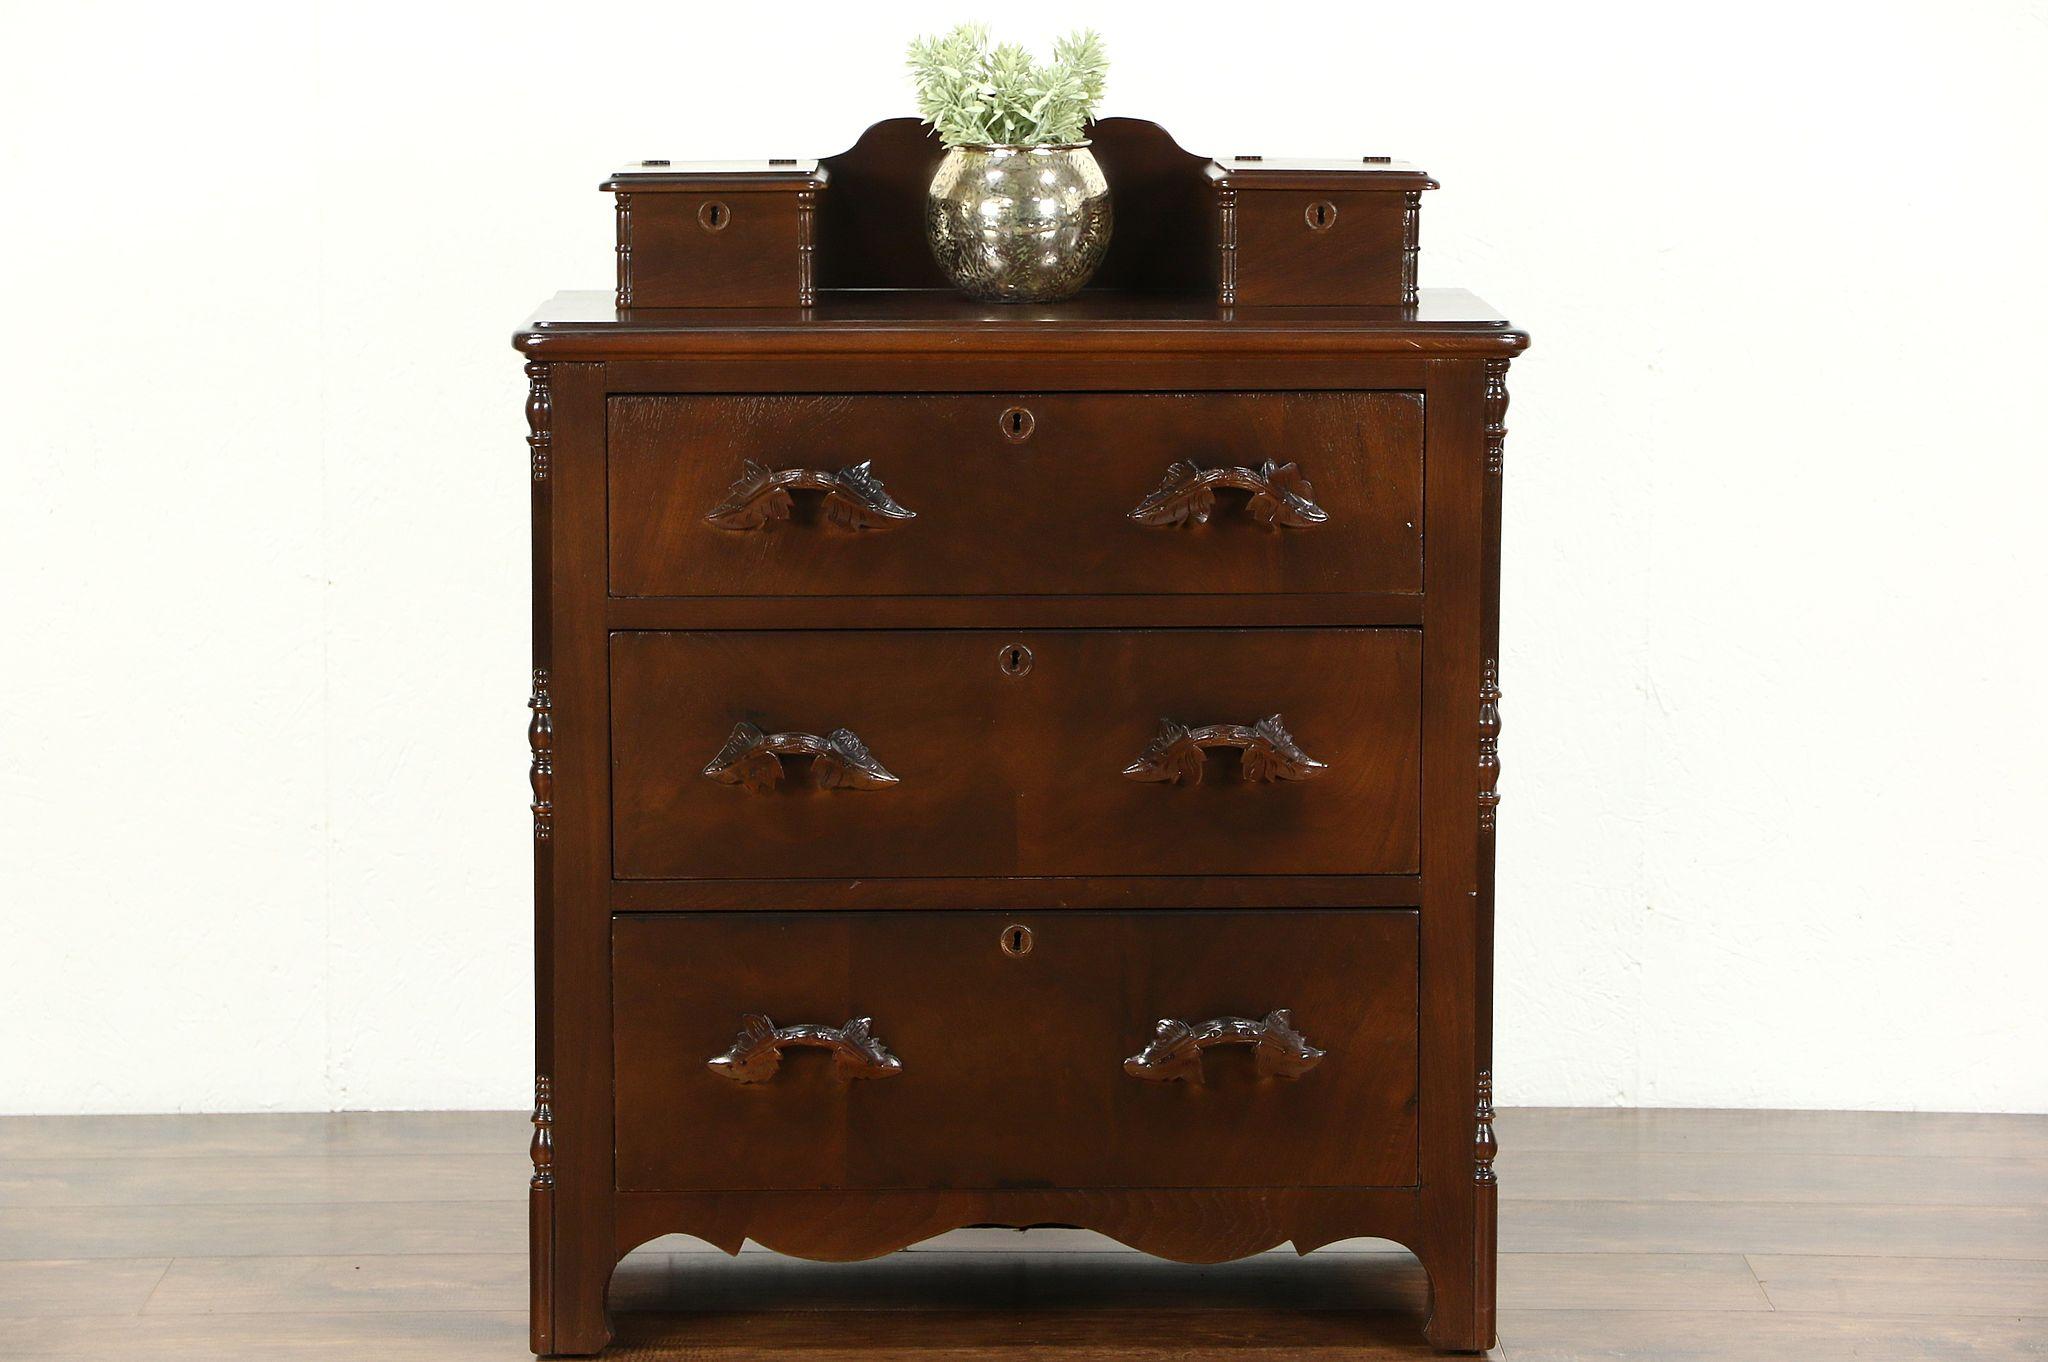 Antique Dressers Value Bestdressers 2017